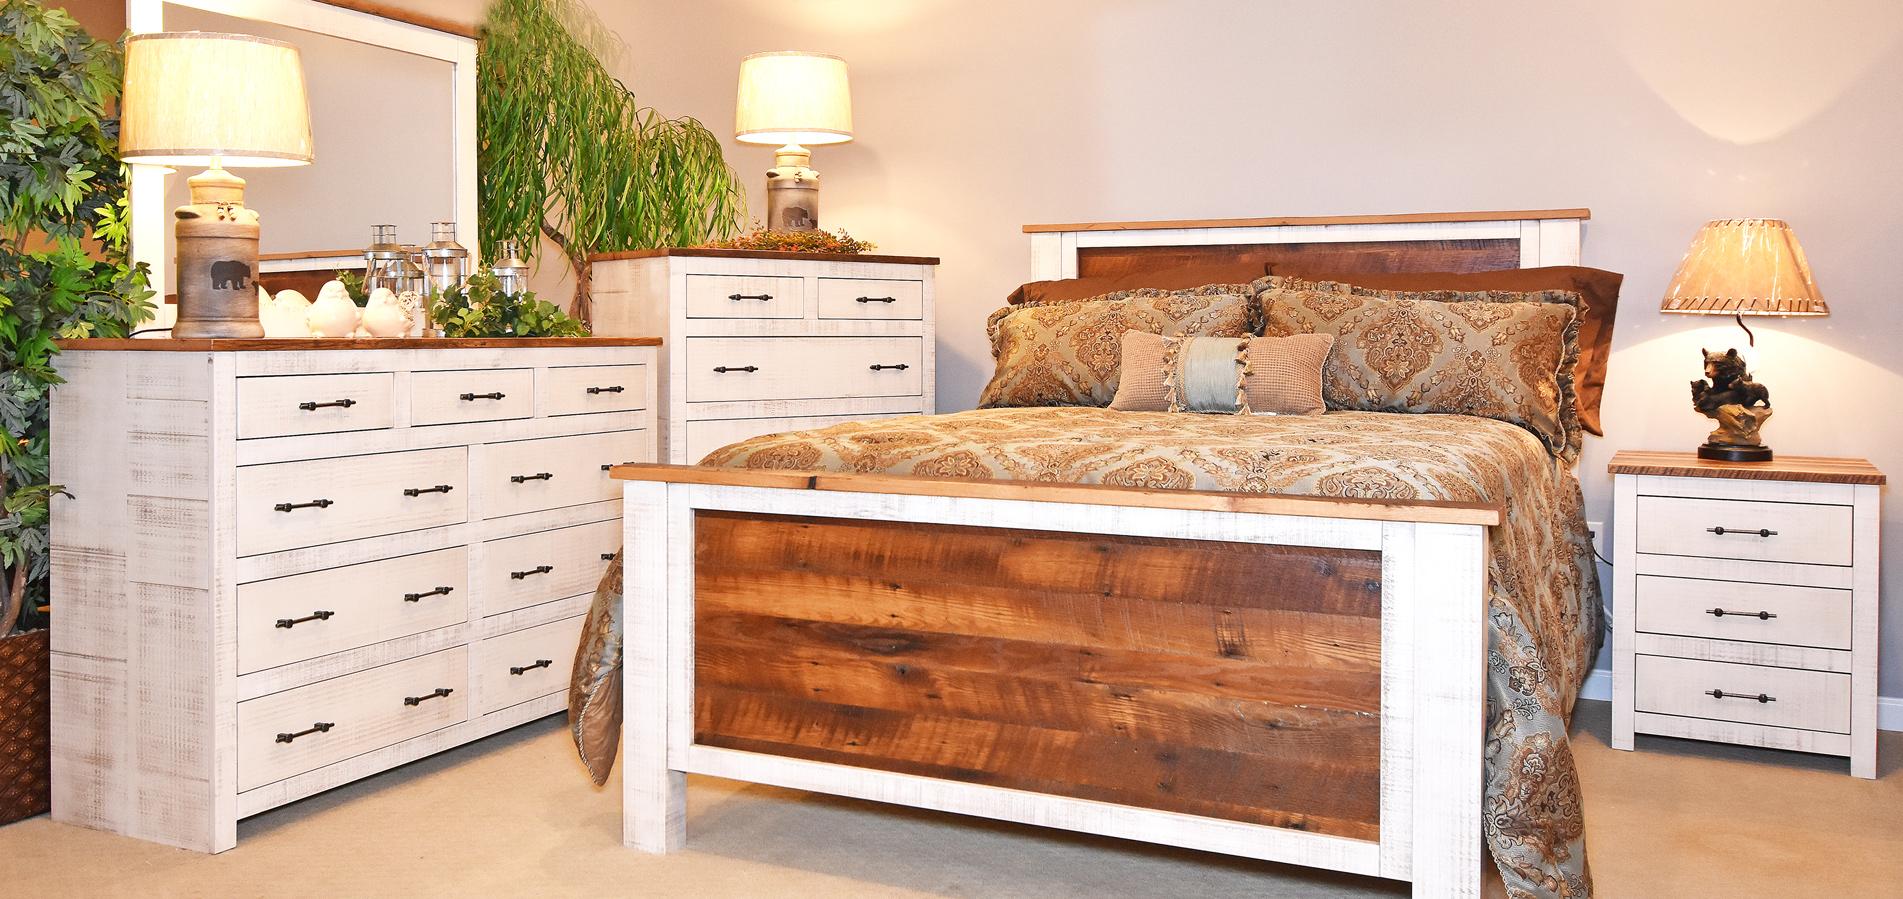 barnwood-lincoln-bedroom-set-1903-x-899jpg.jpg